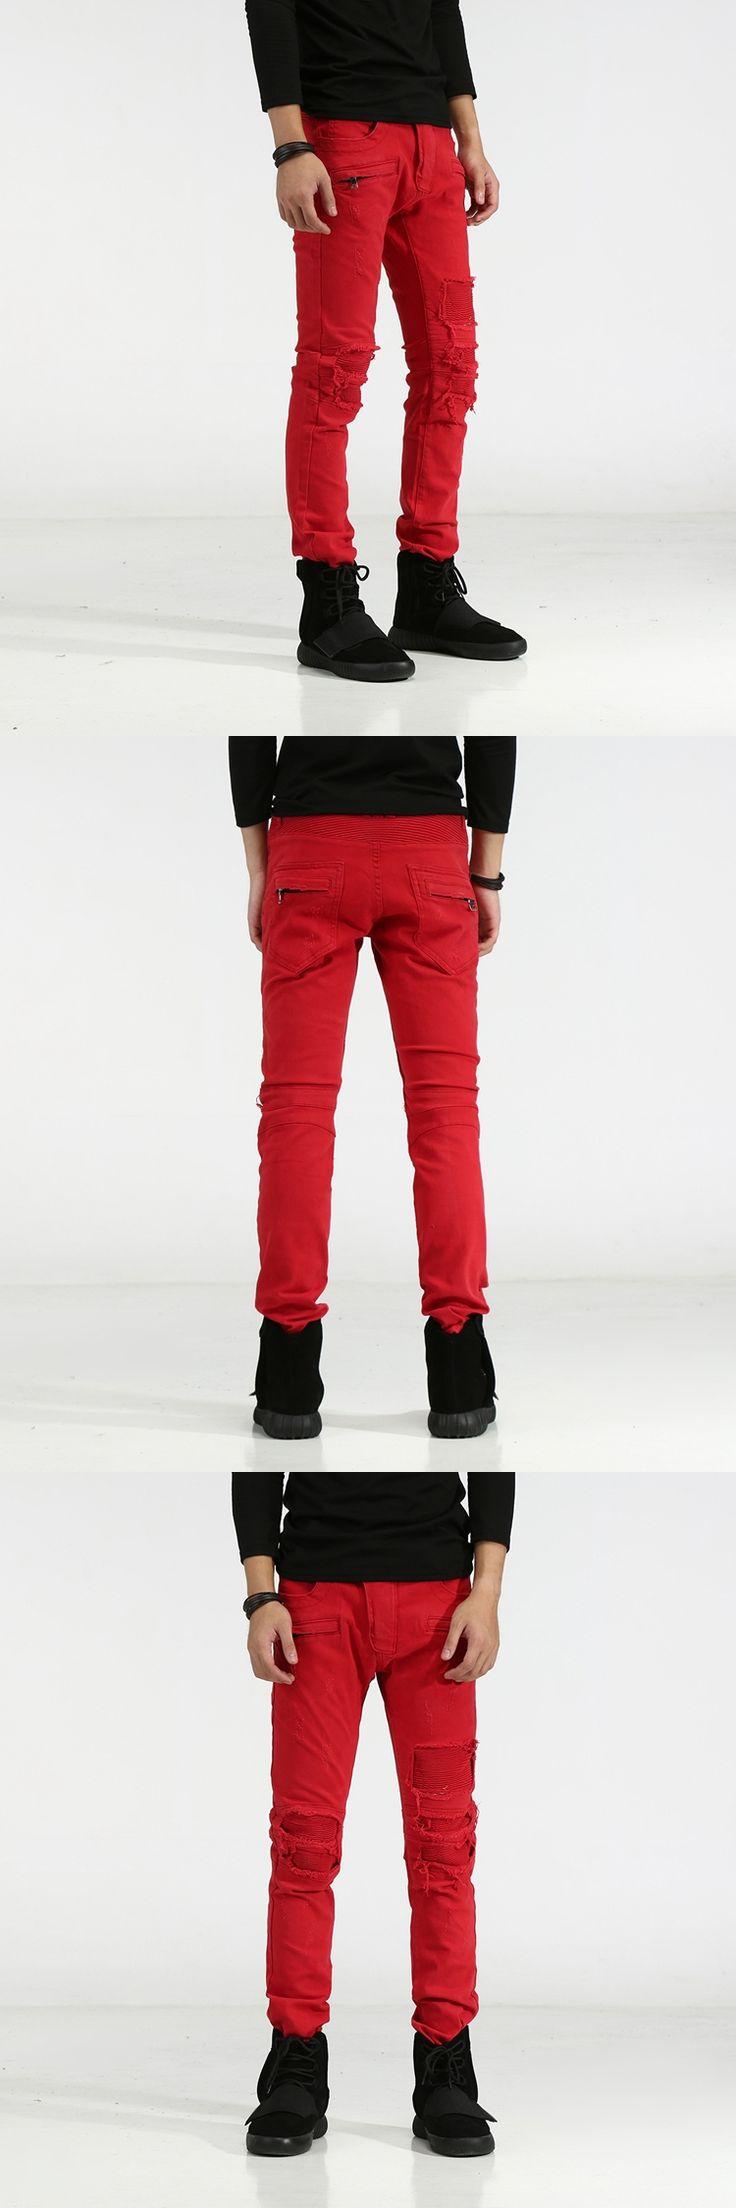 New Distressed Biker Jeans Men High Quality Mens Casual Slim Elastic Straight Denim Red Jeans Skinny Jeans Men Pants 29-42